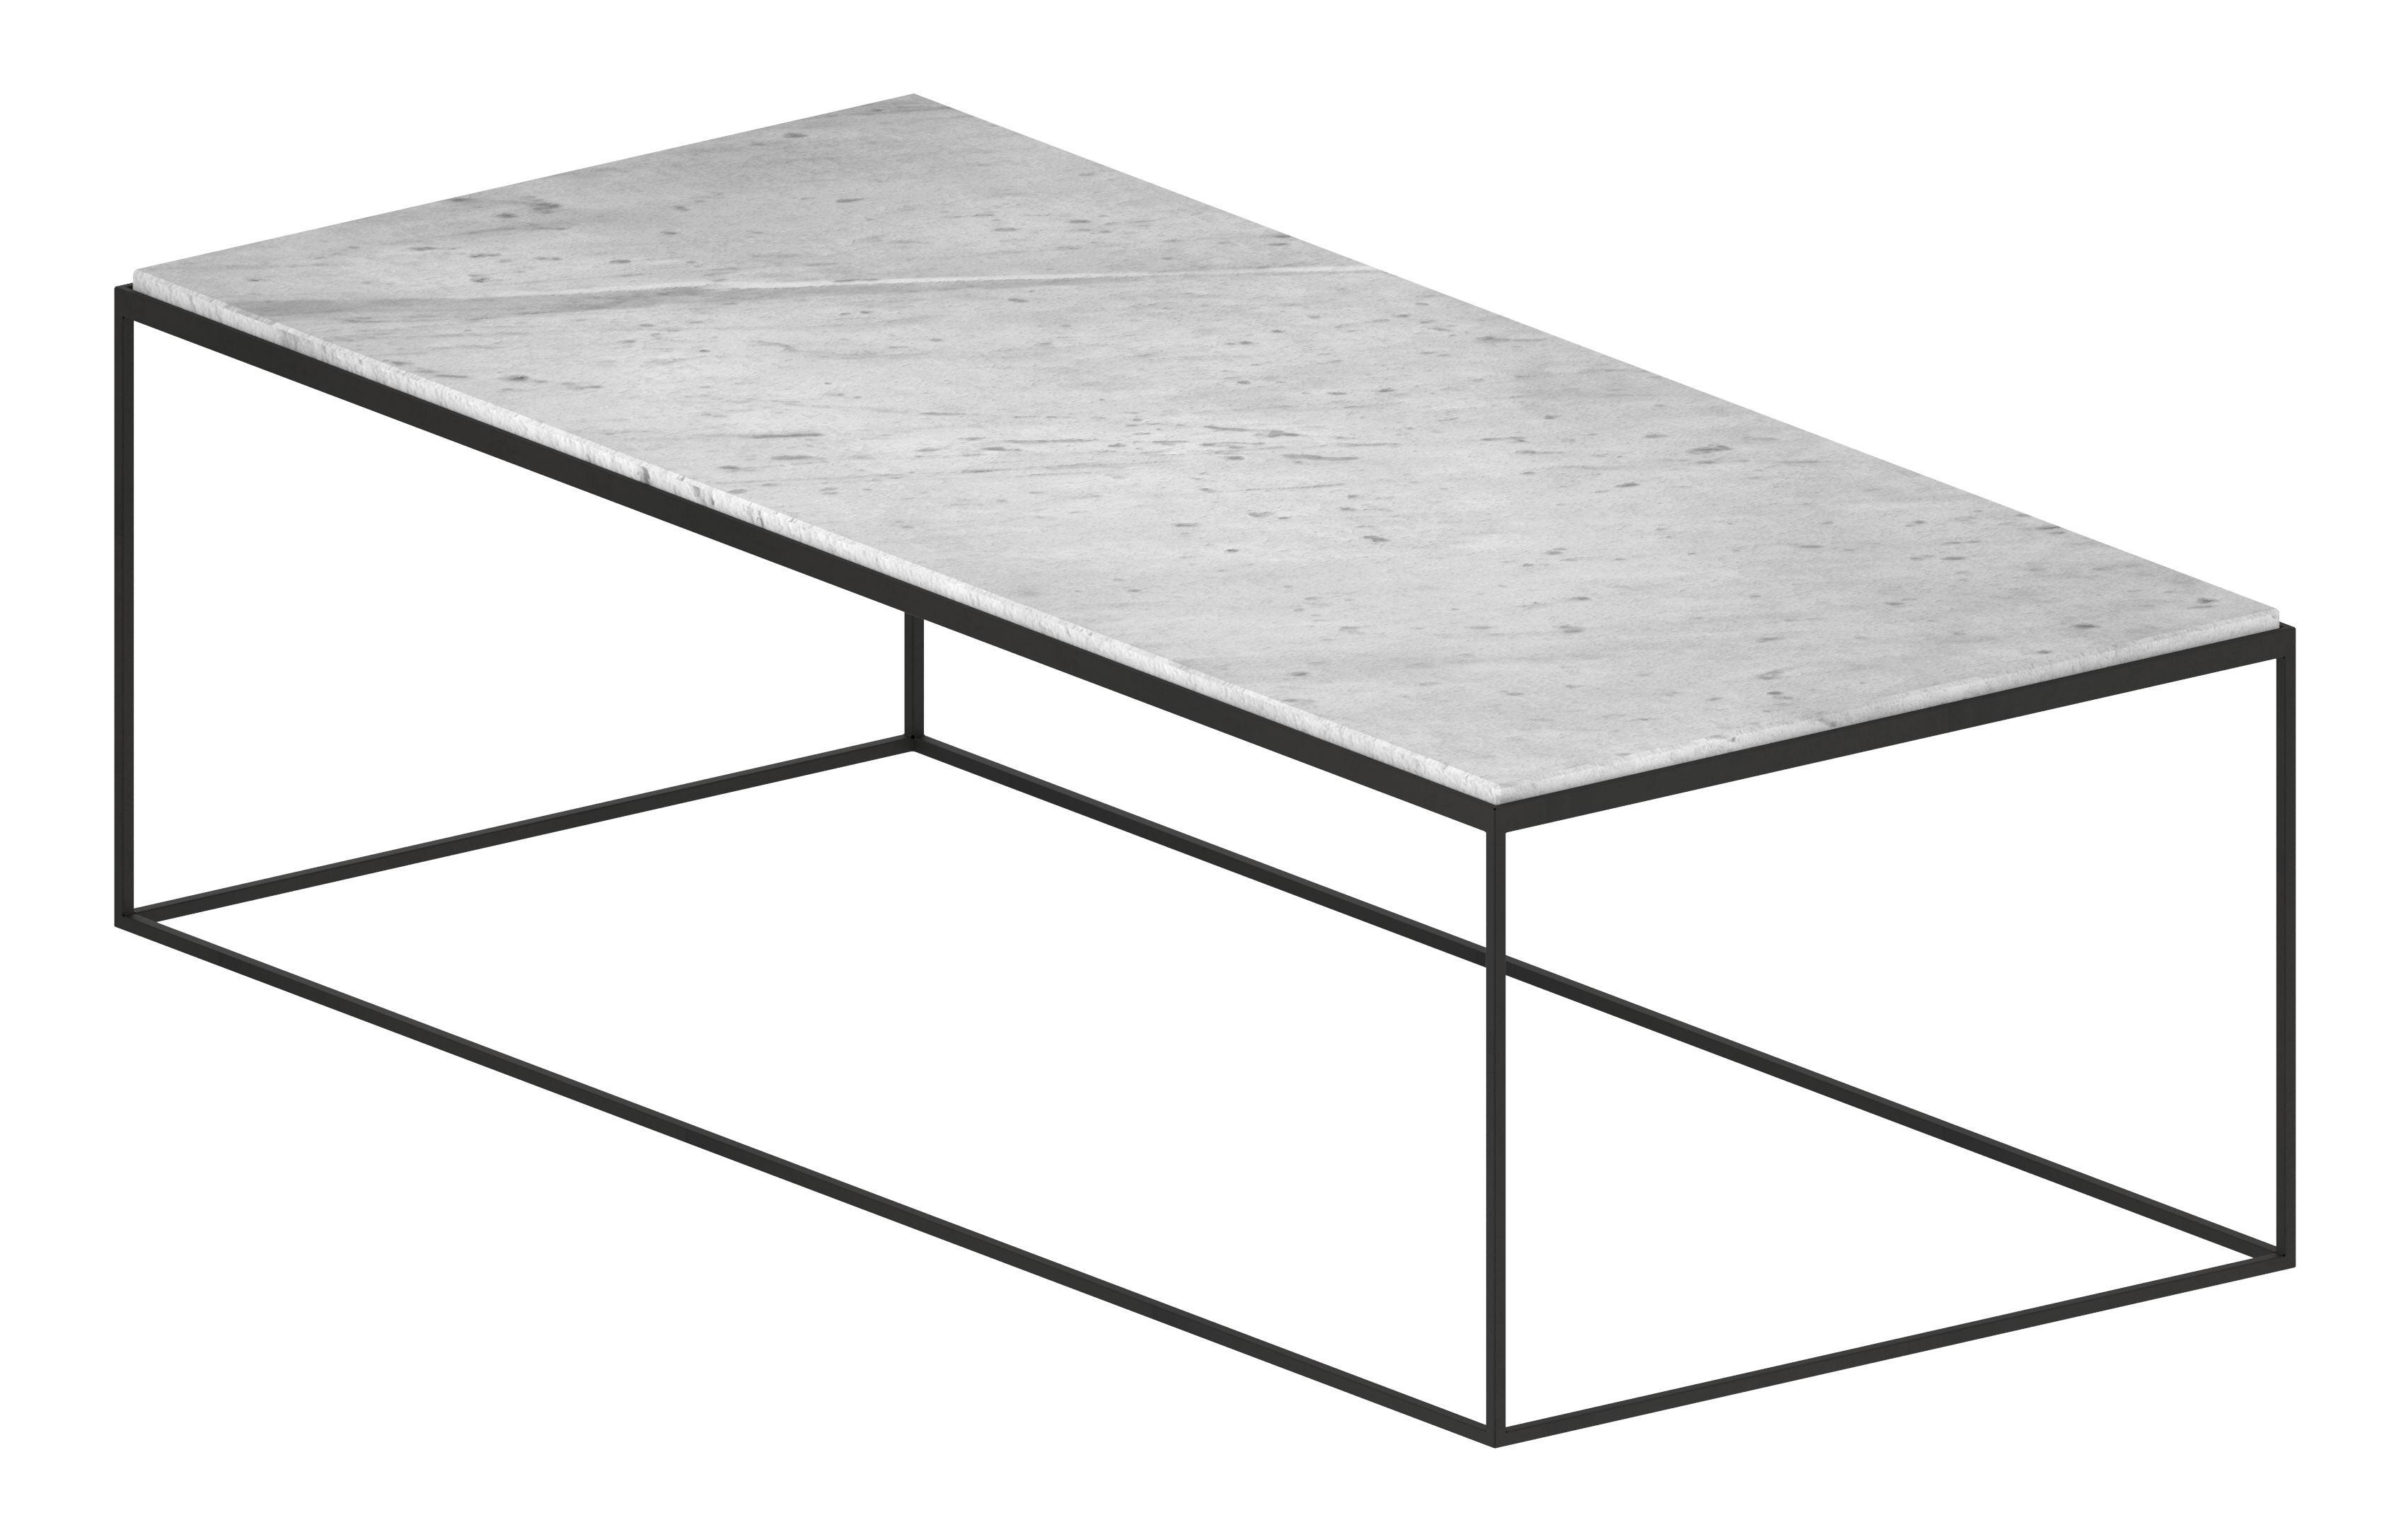 table basse slim marbre 118 x 53 x h 36 cm large marbre blanc zeus. Black Bedroom Furniture Sets. Home Design Ideas